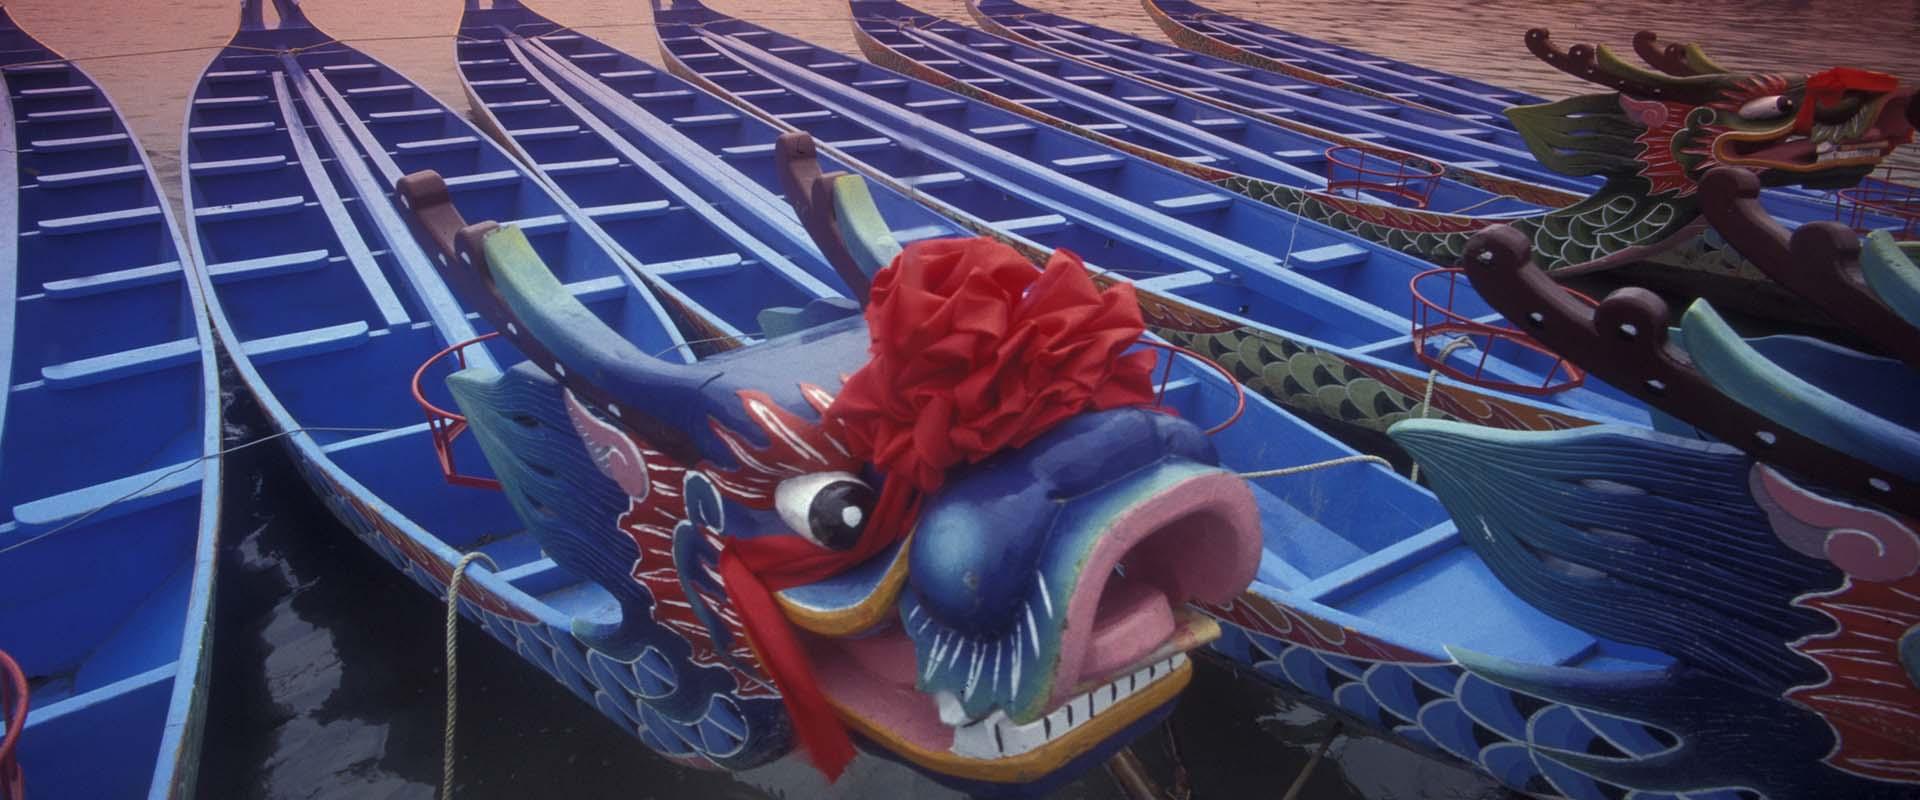 Dragon Boat Festival And